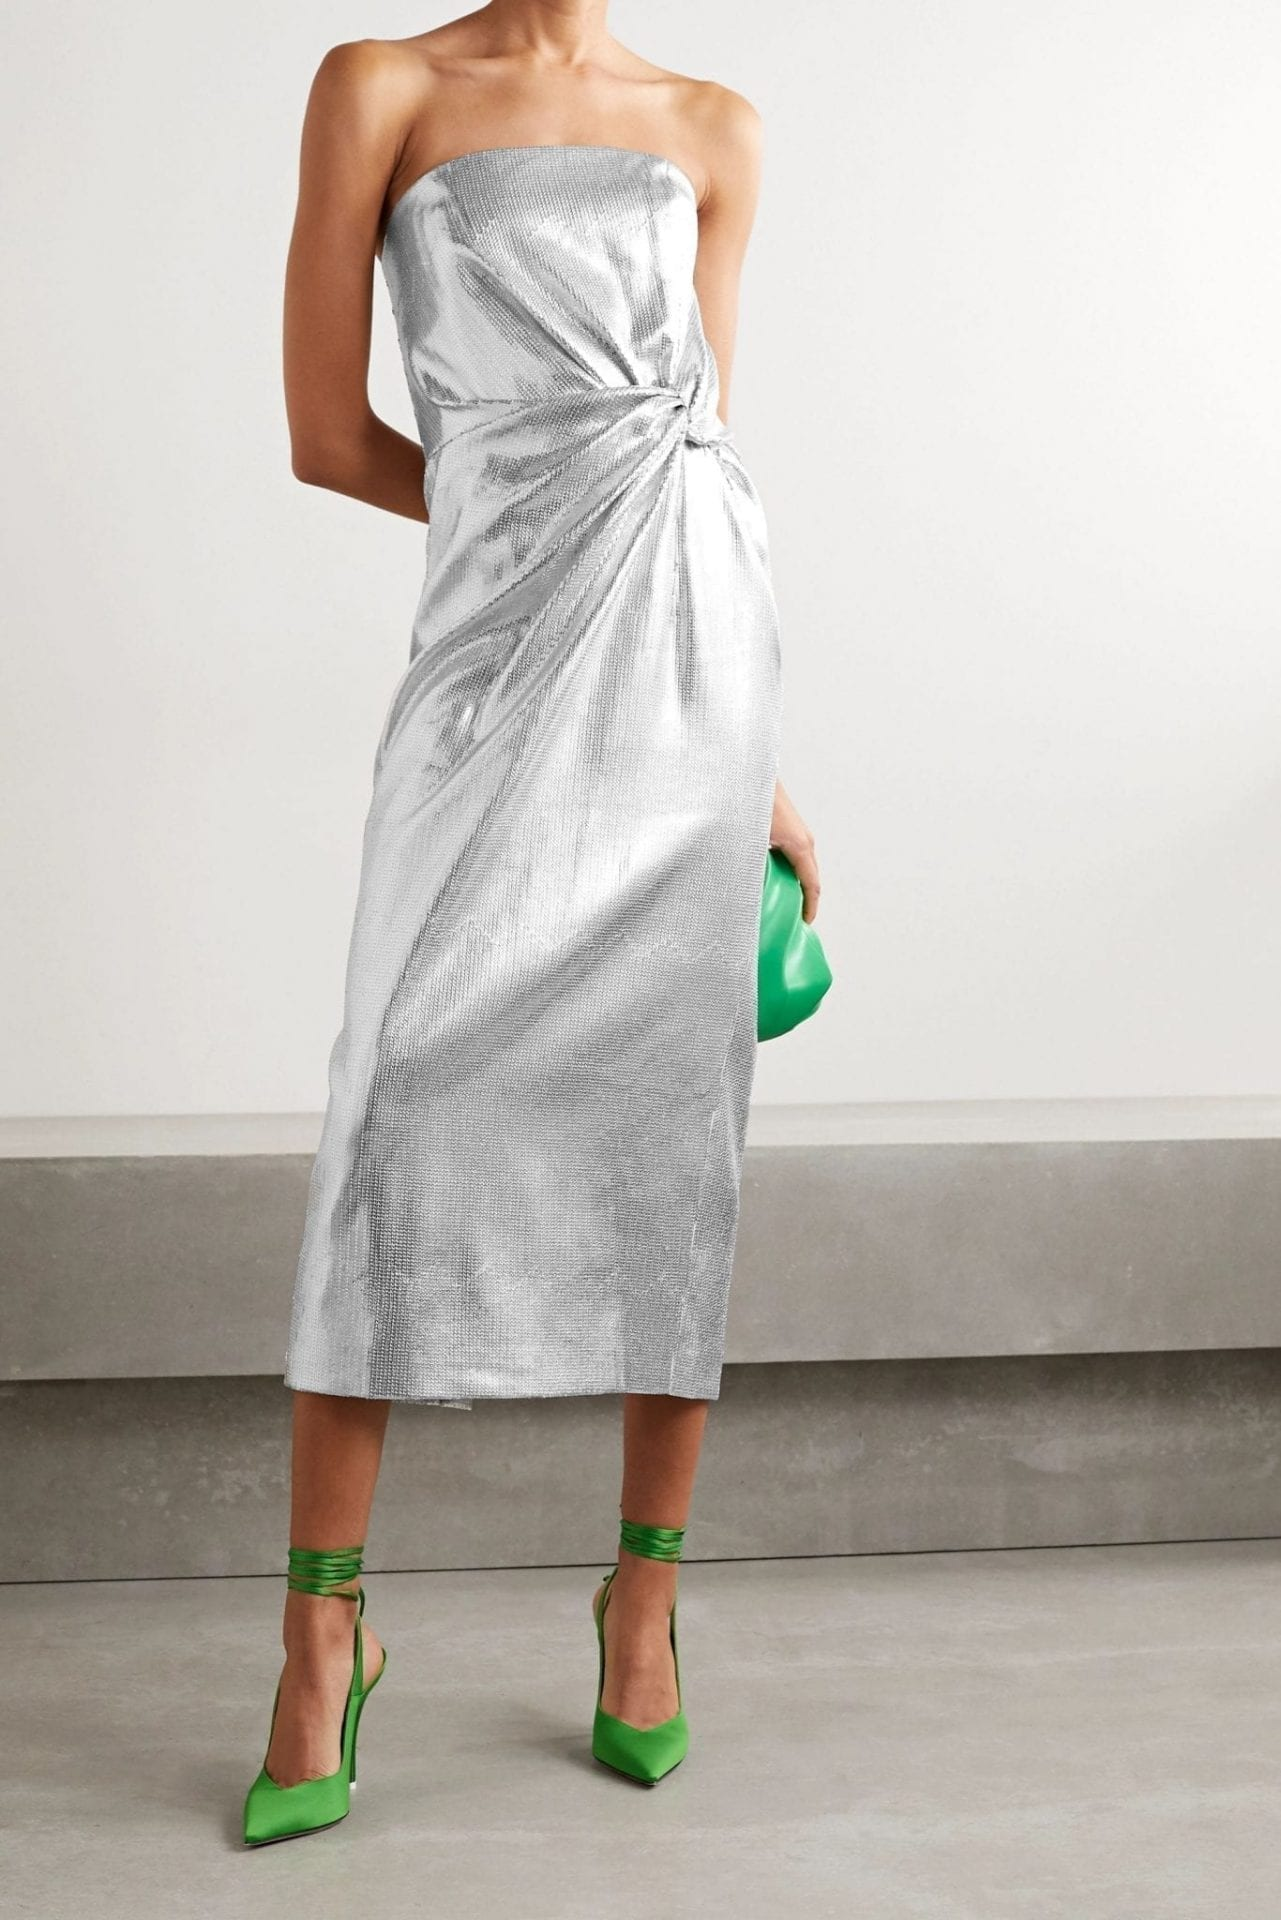 16ARLINGTON Himawari Strapless Knotted Sequined Crepe Midi Dress